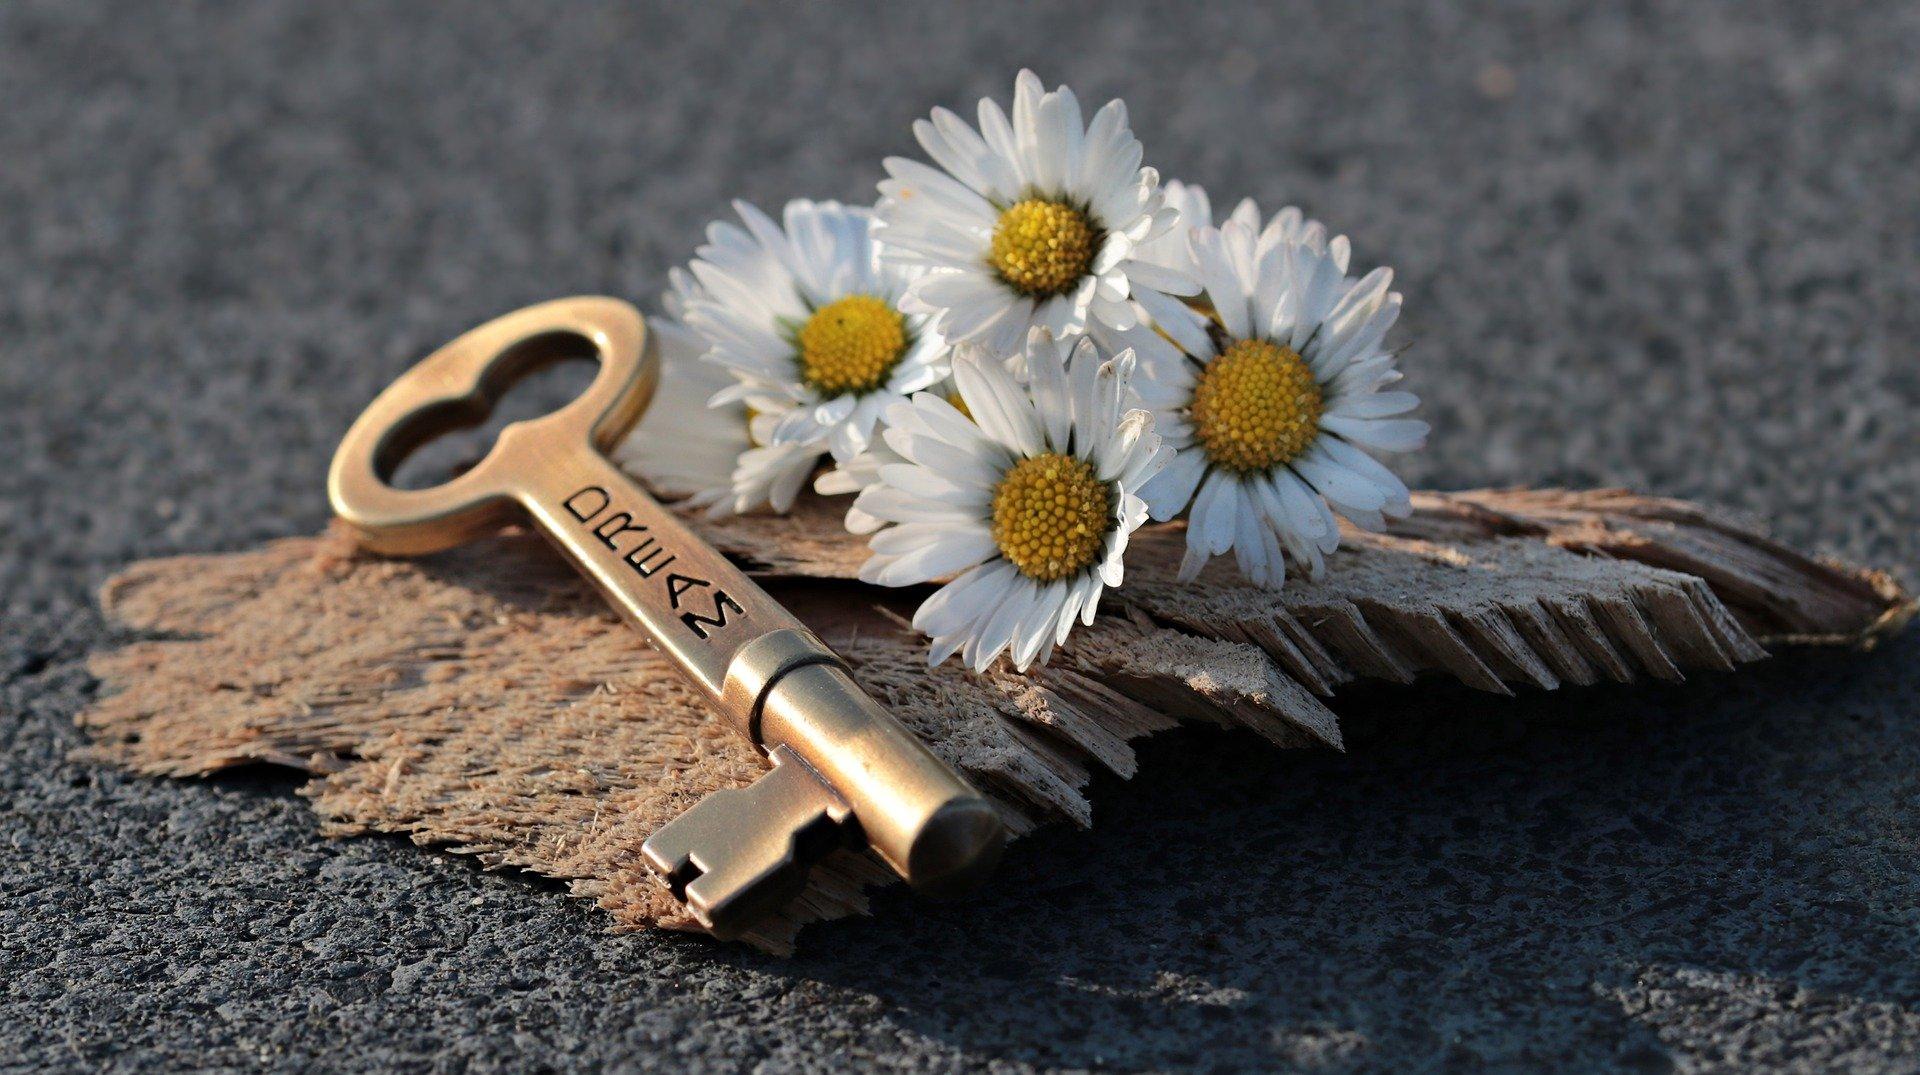 Schlüssel.jpg